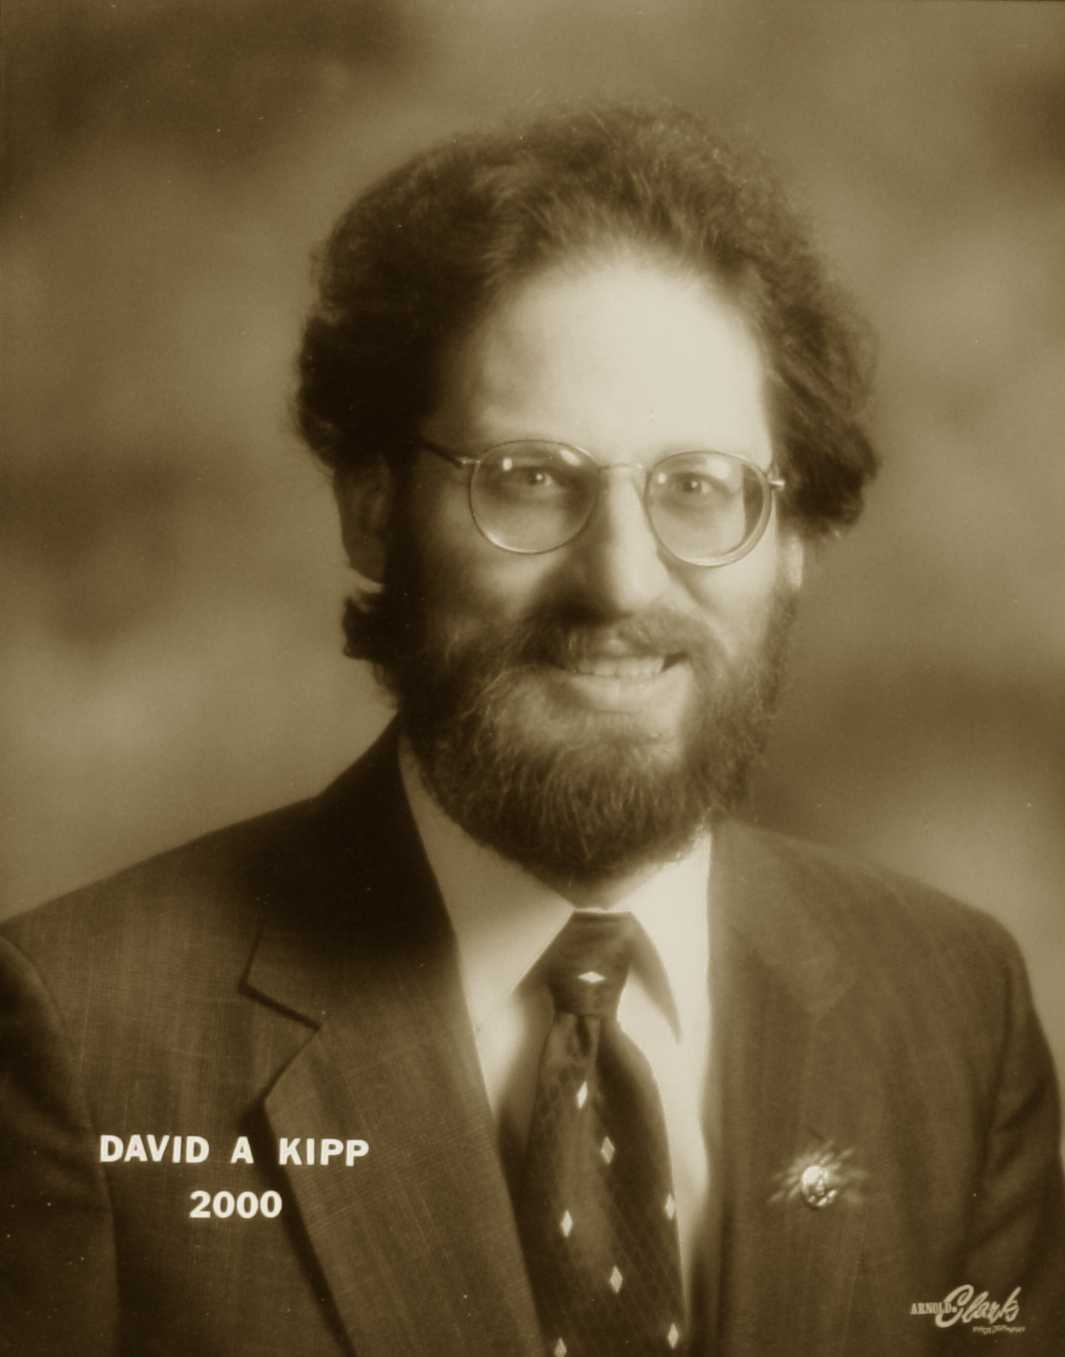 David A. Kipp, 2000